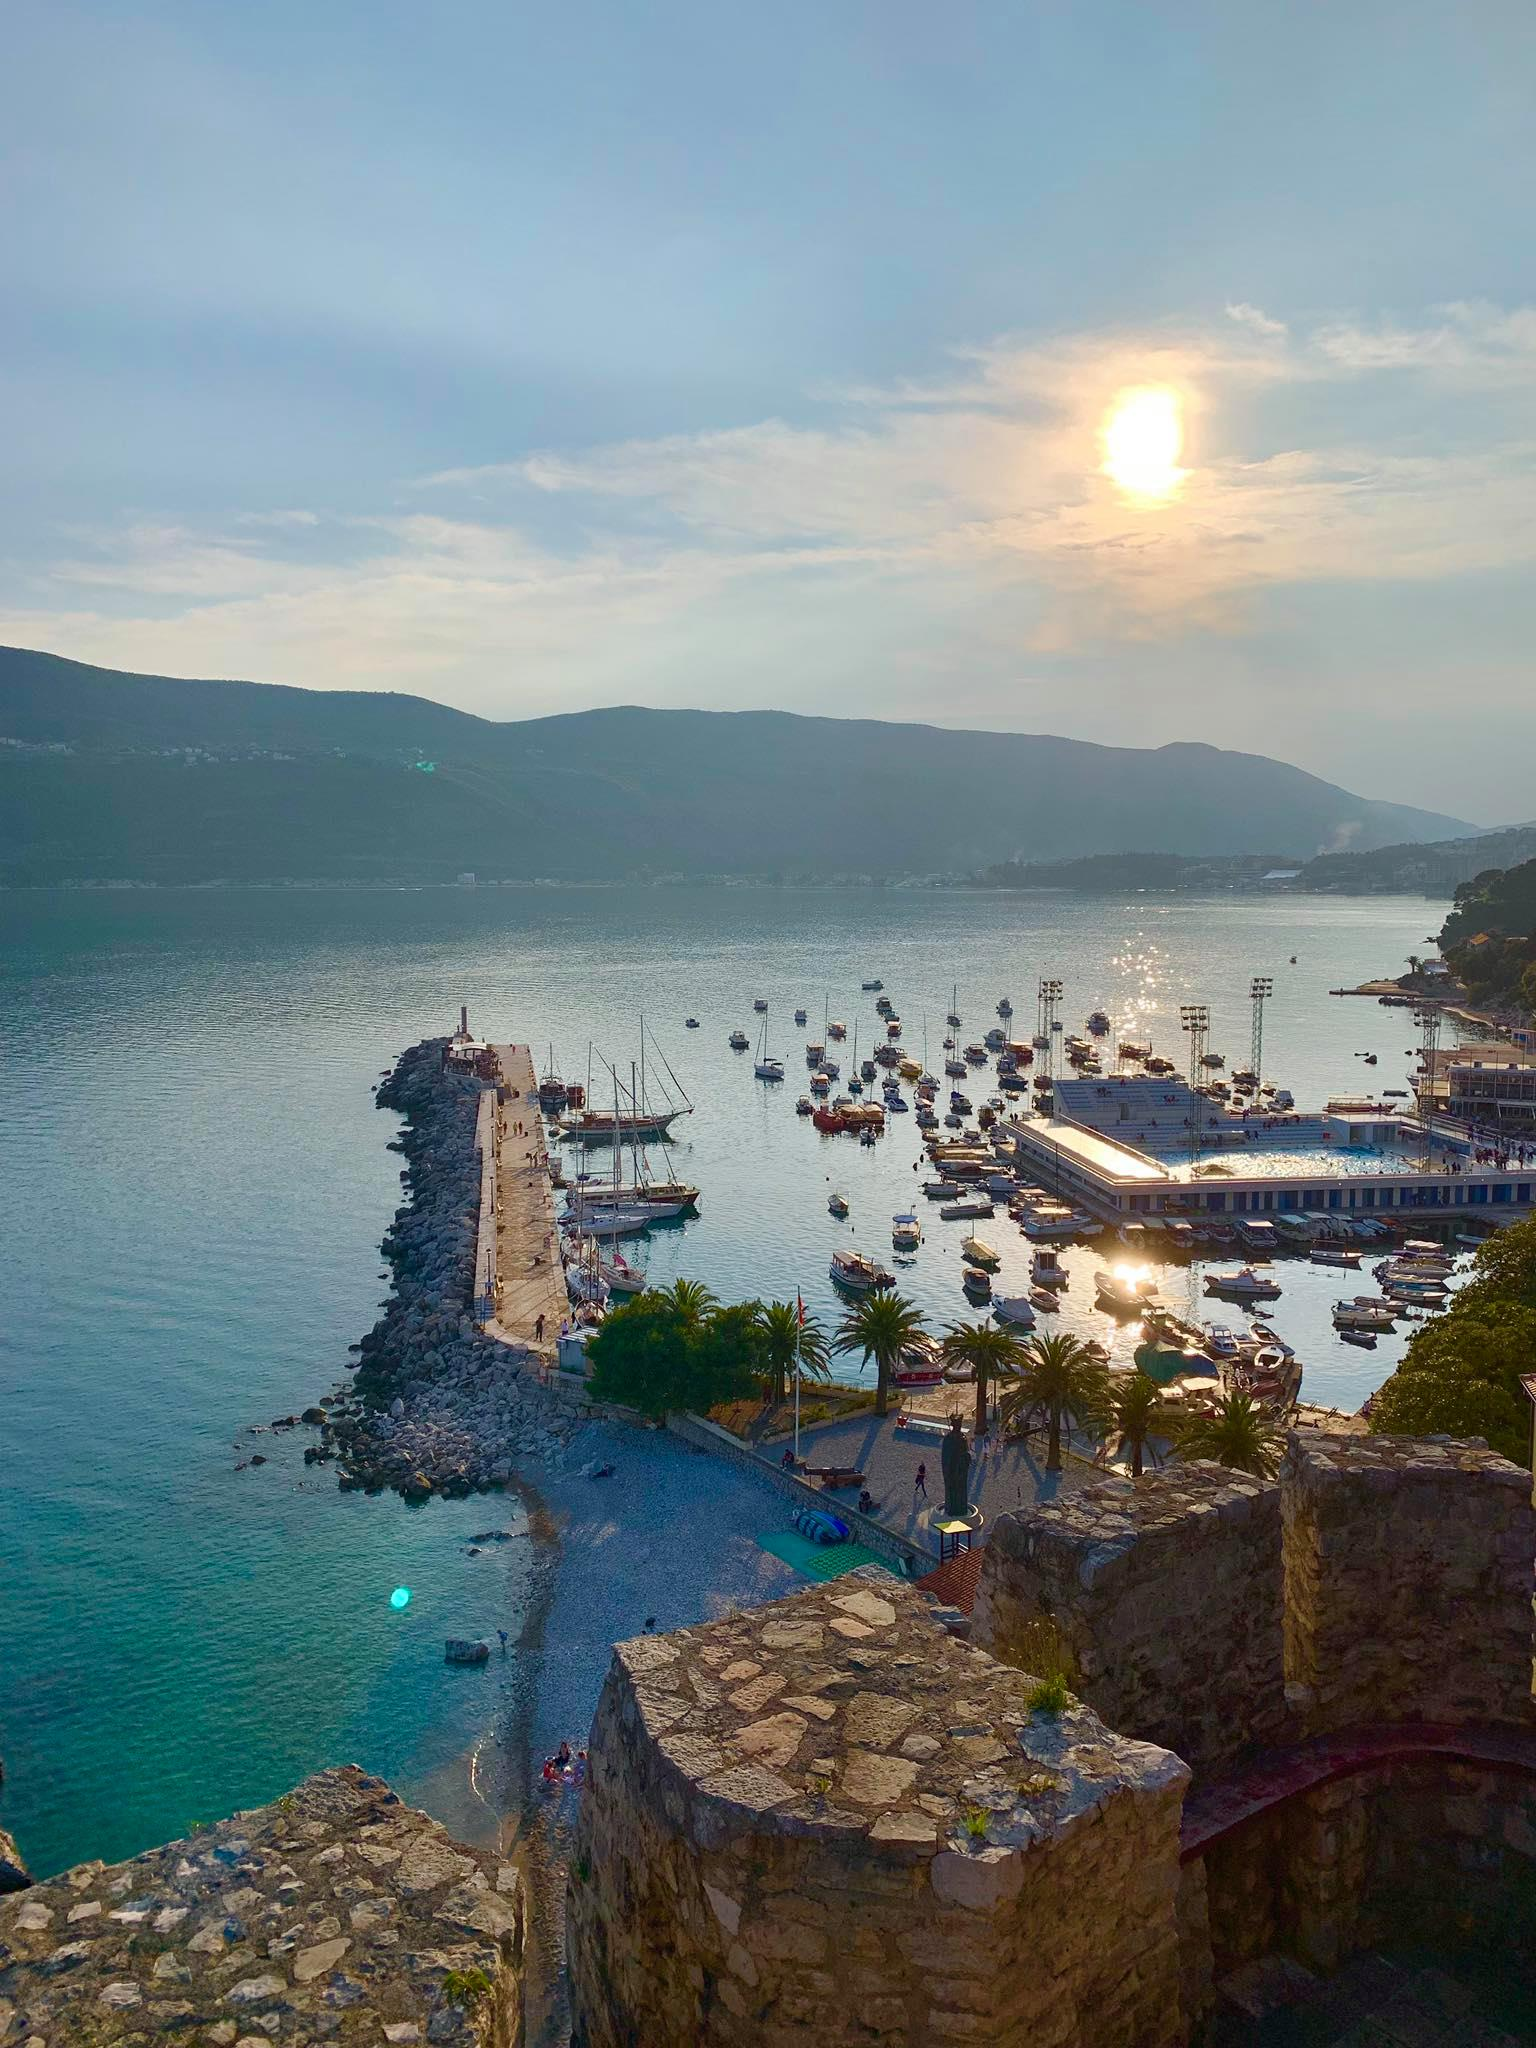 Expat Life in Montenegro Day 2 First full day in Herceg Novi11.jpg